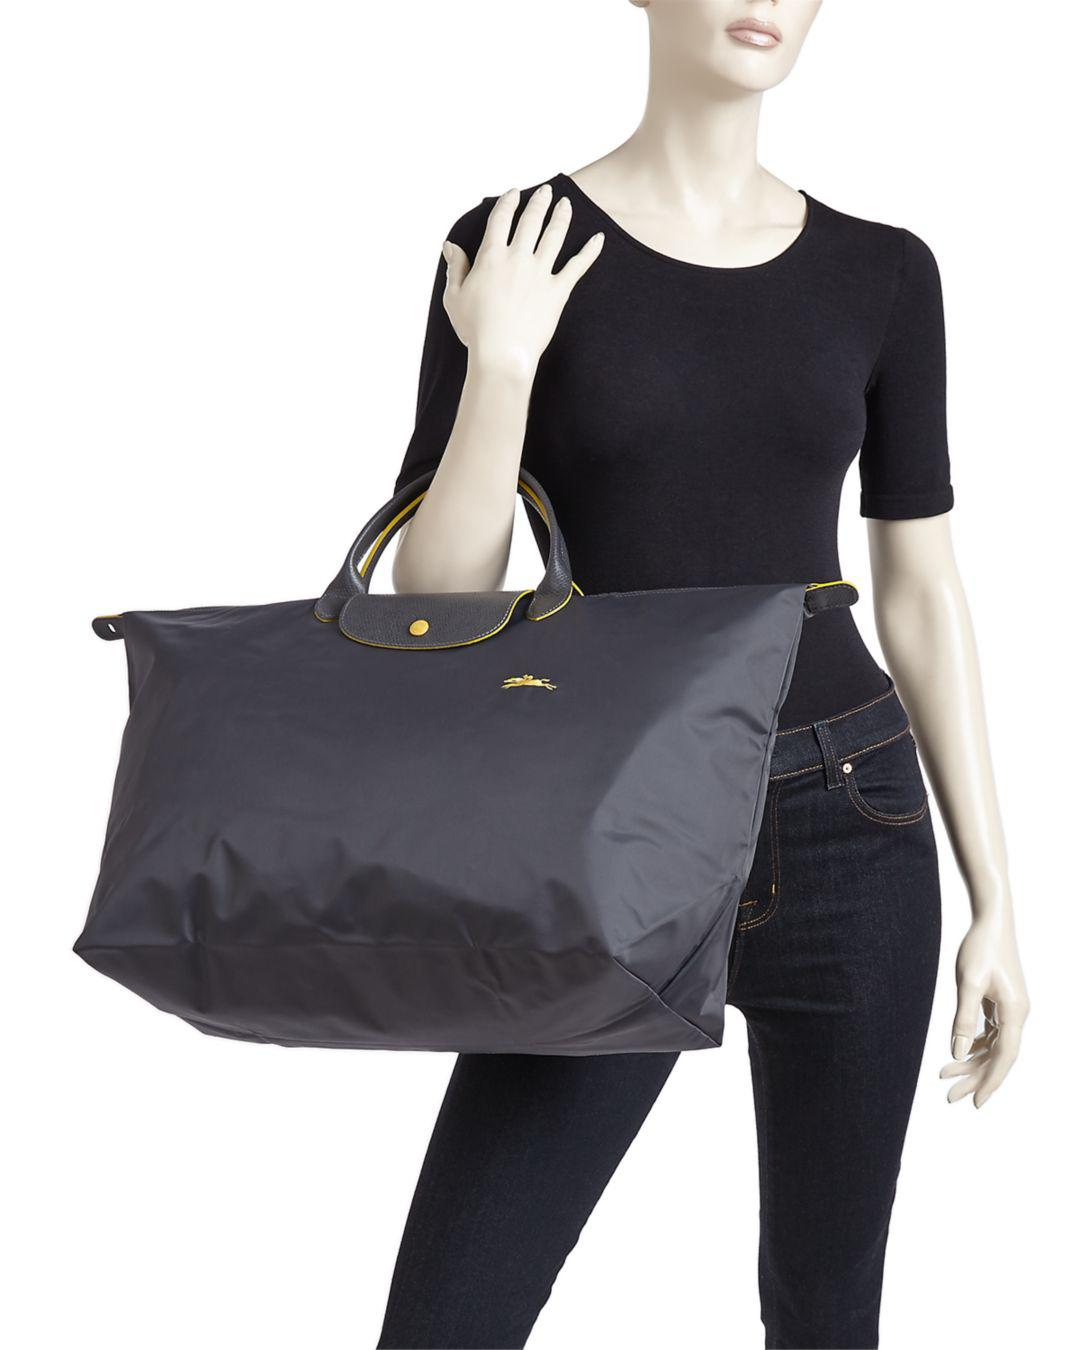 Lyst - Longchamp Le Pliage Club Large Nylon Canvas Travel Bag f31262bdabc63